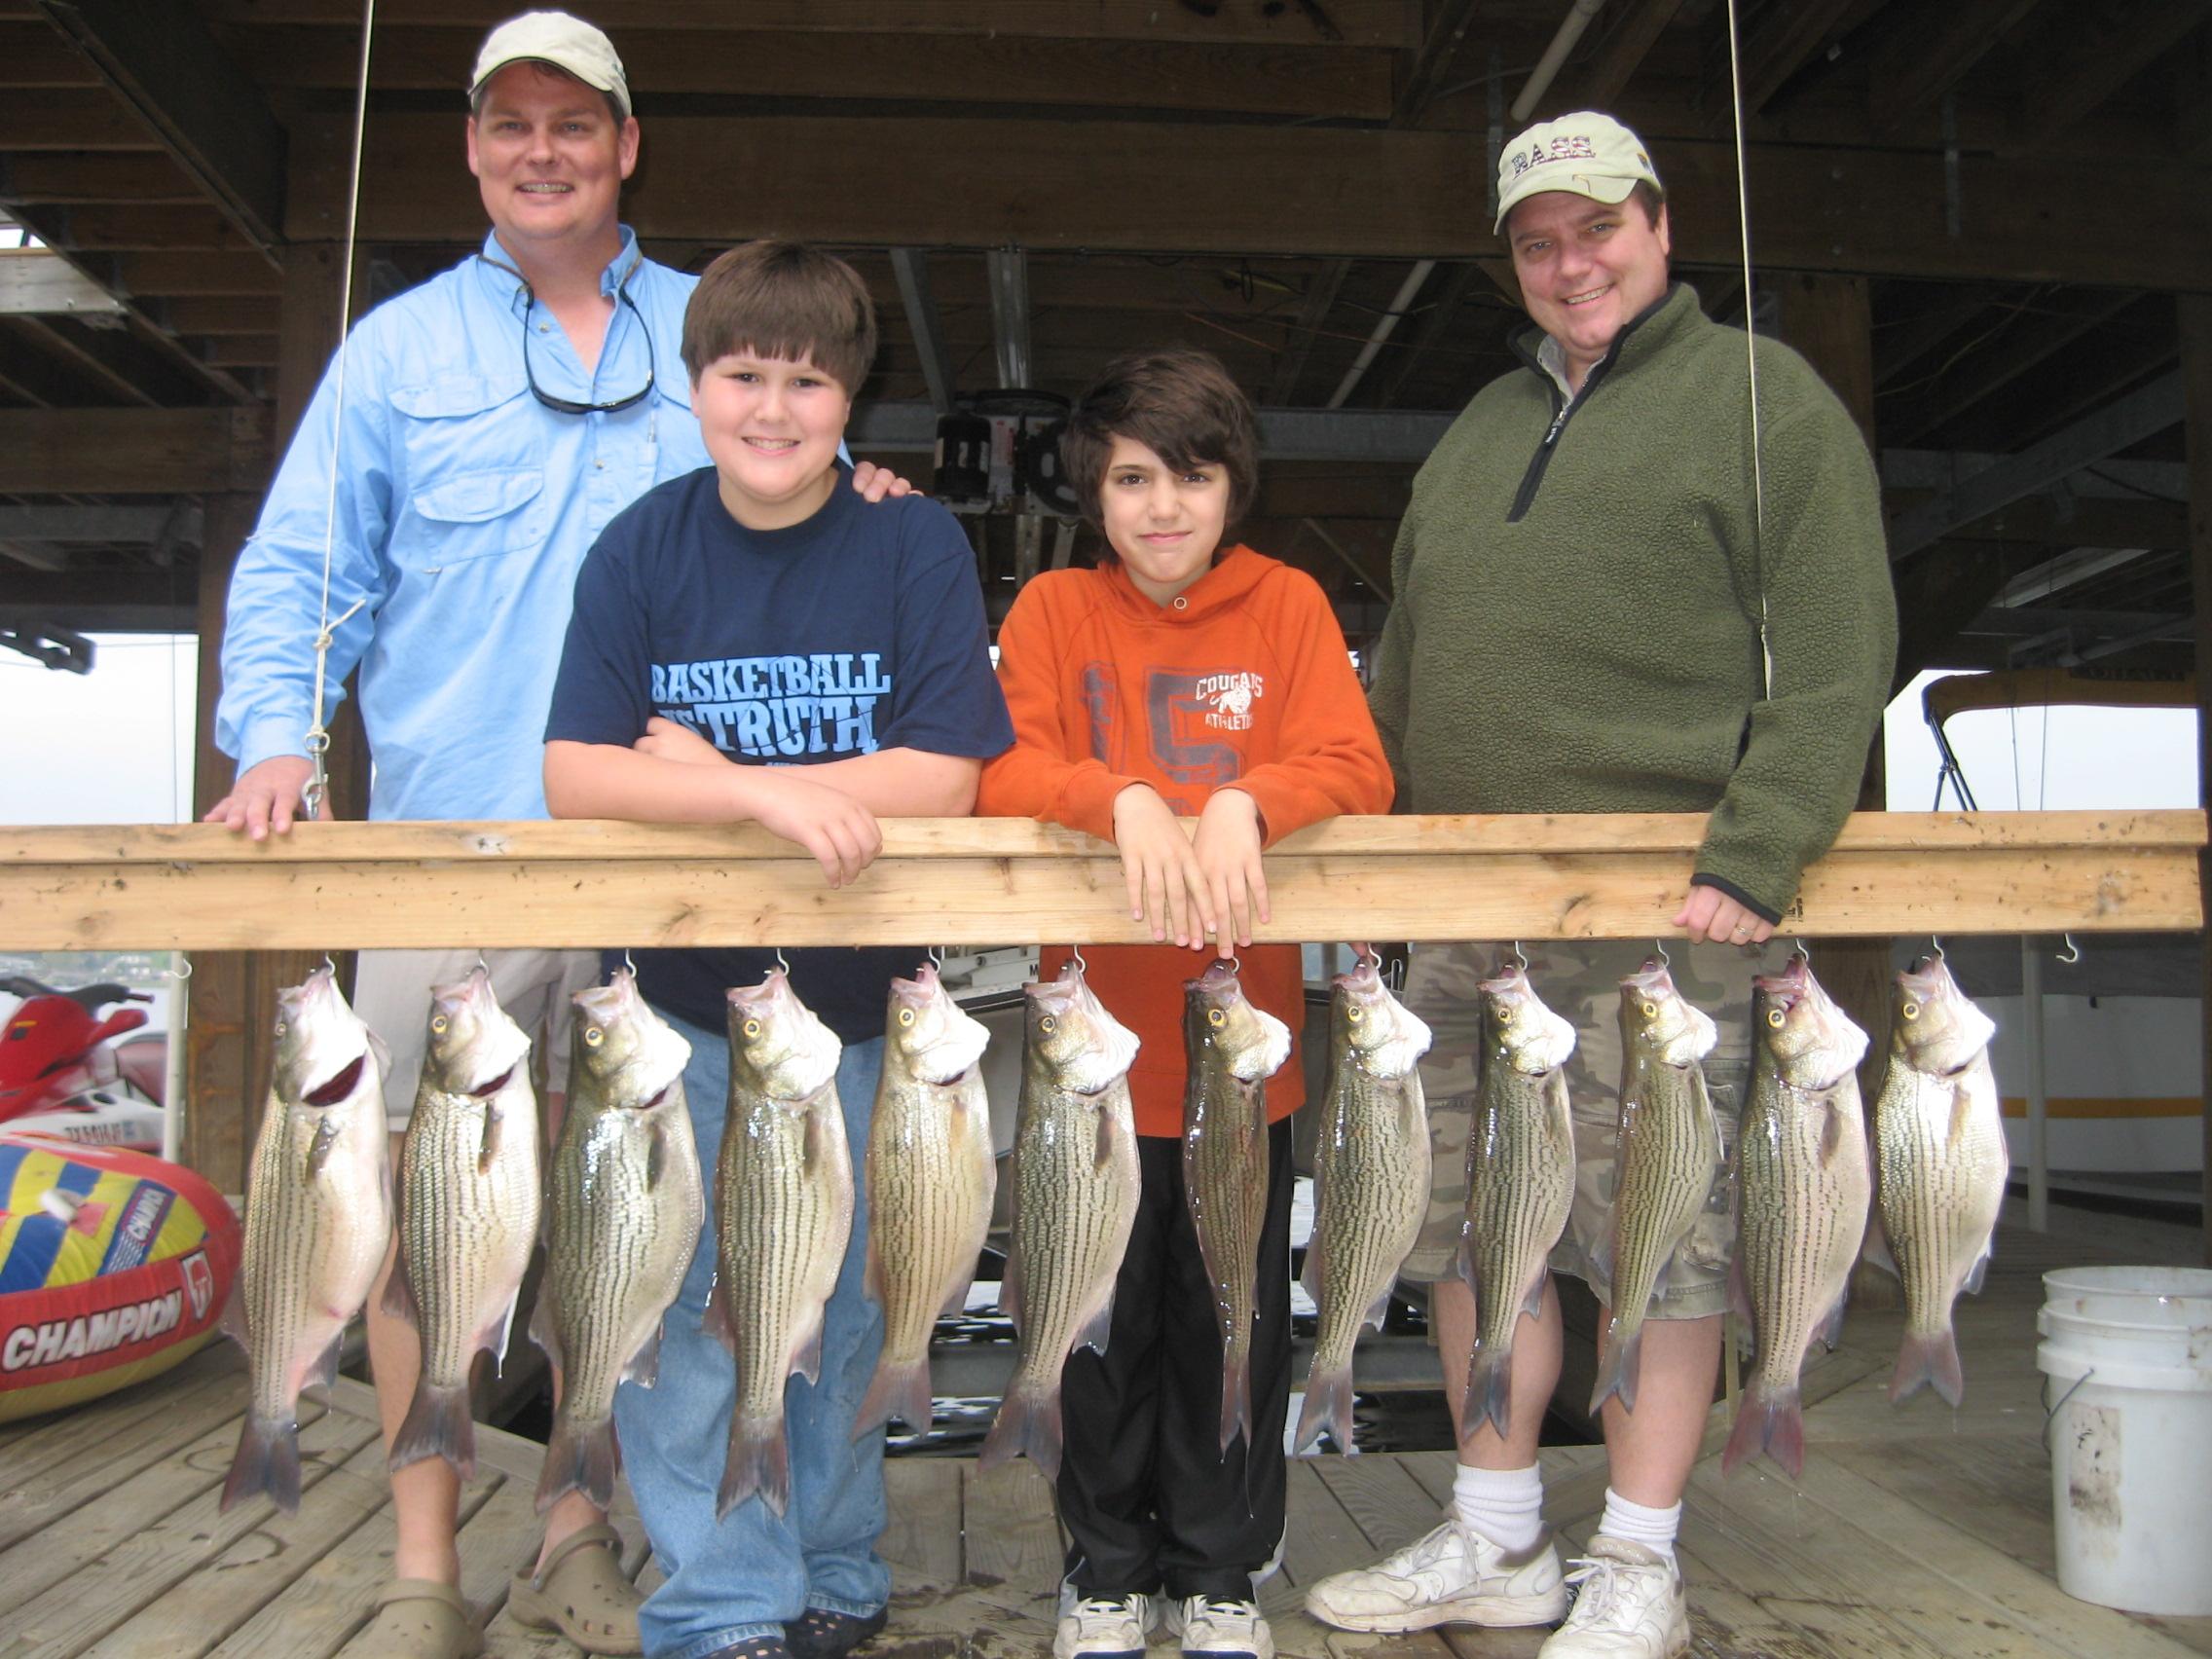 Fish dude 39 s guide service lake conroe guided fishing trips for Lake conroe fishing